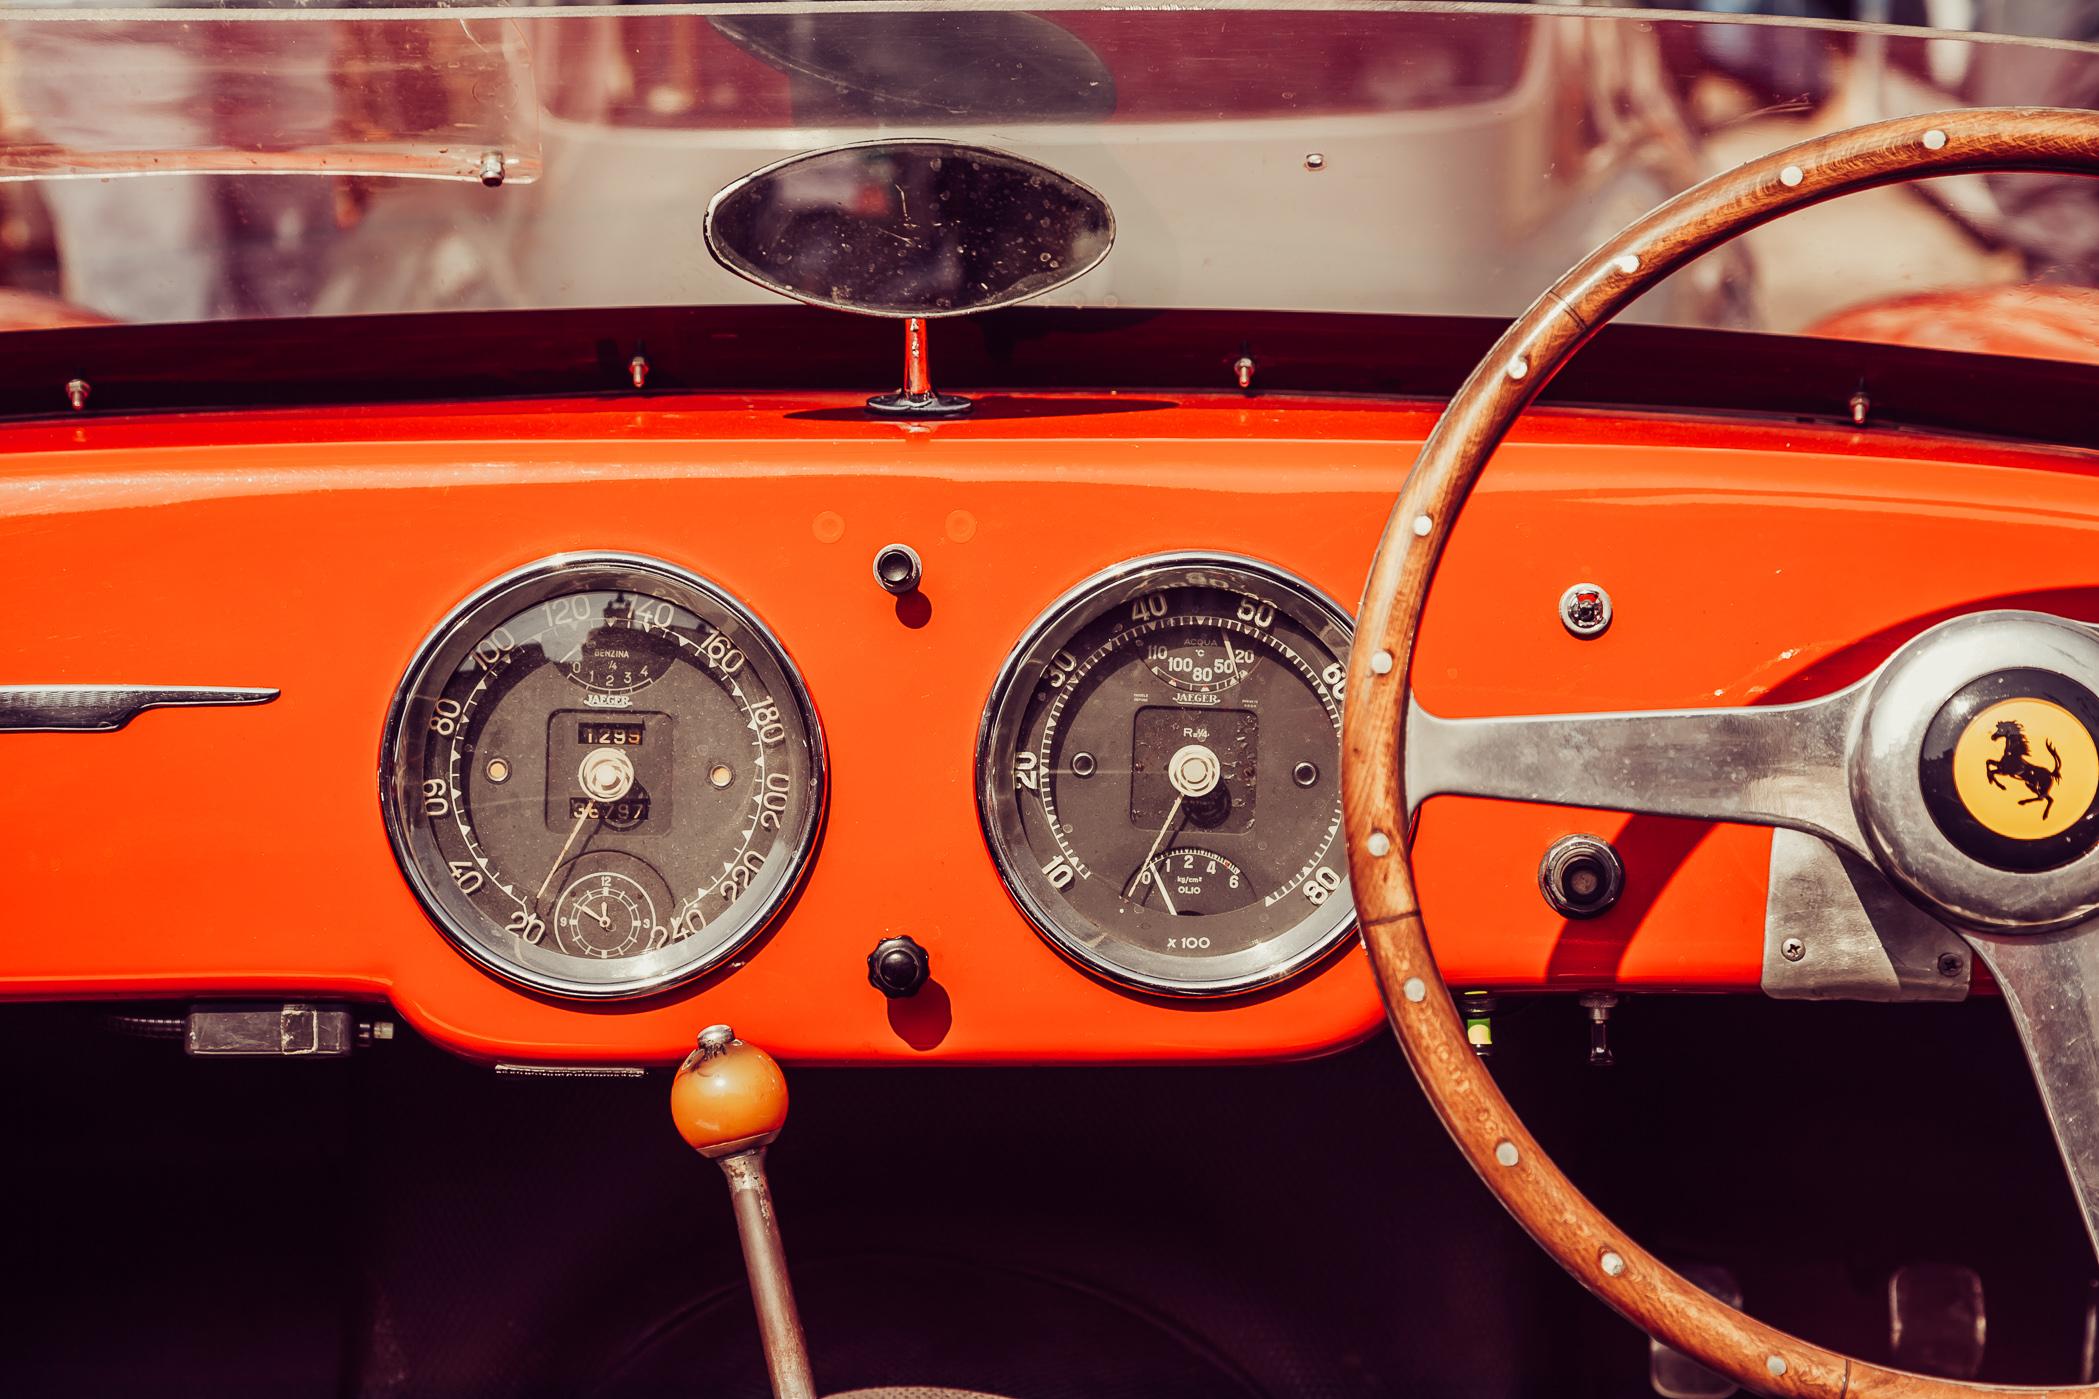 Mille Miglia, Florian Kresse, Legend, Rennlegende, Rennfahrer, Rom, Fiat, Ferrari, Autofotografie